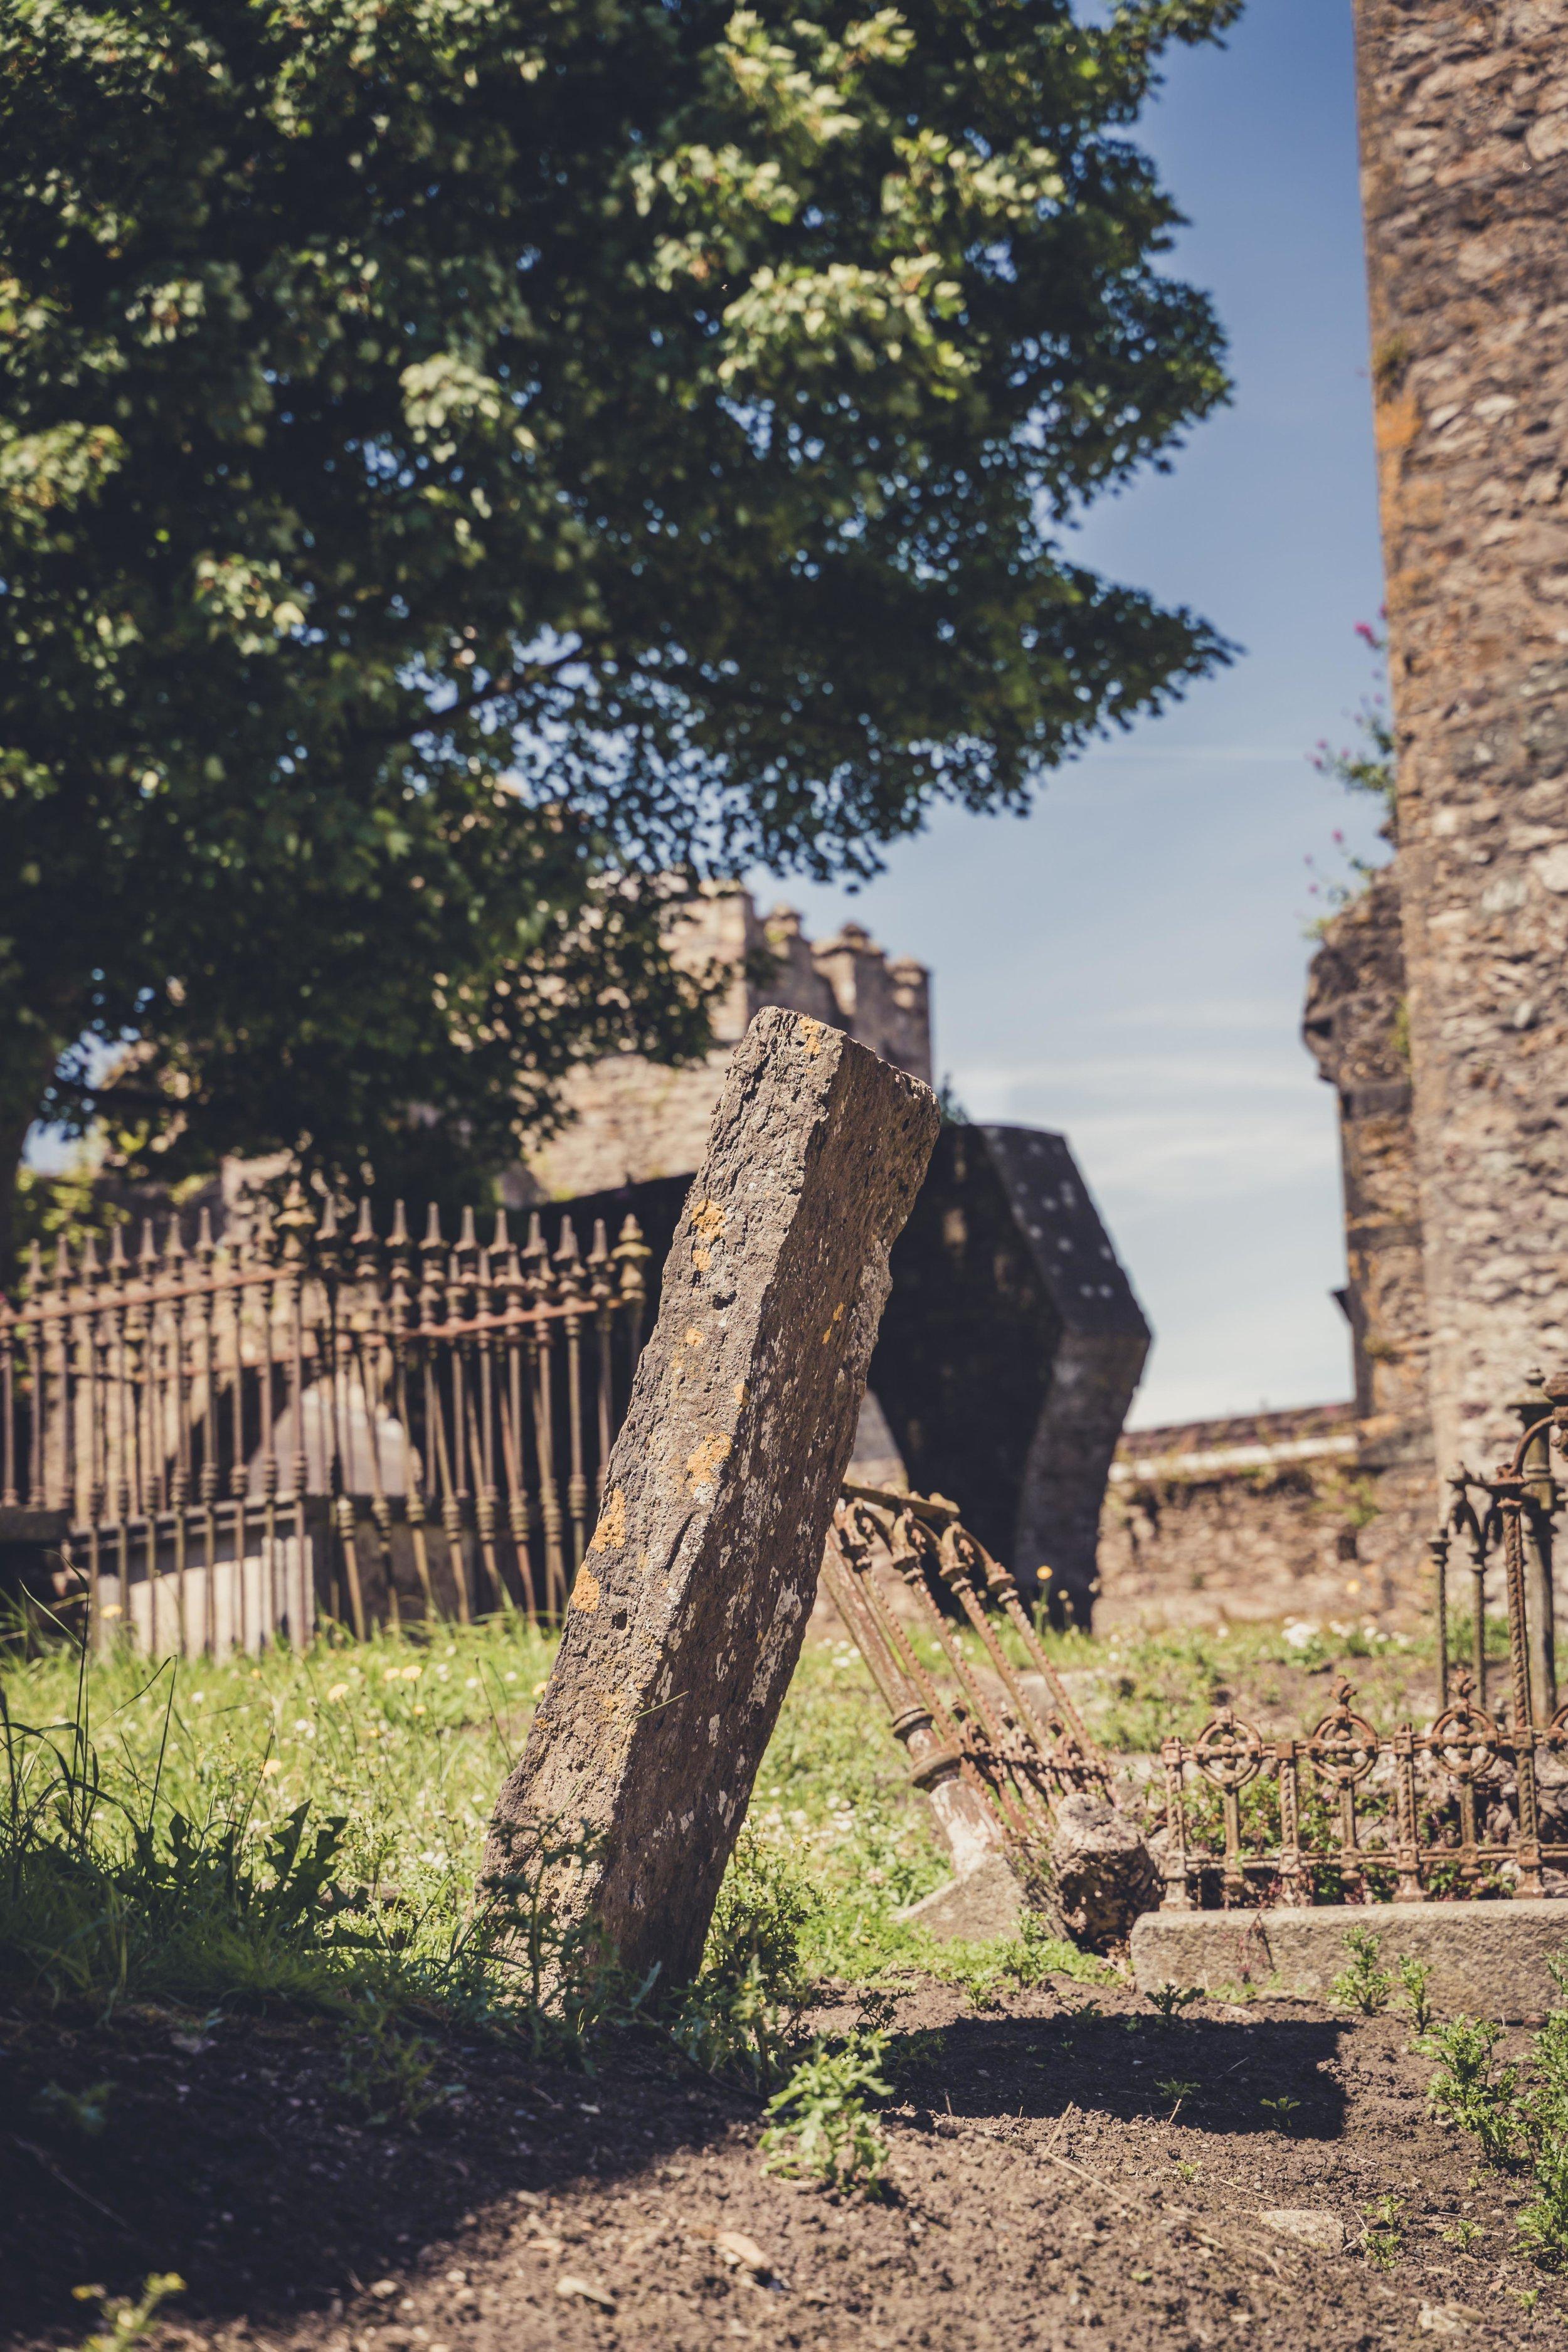 selskar abbey and wexford town ireland head stone.jpg